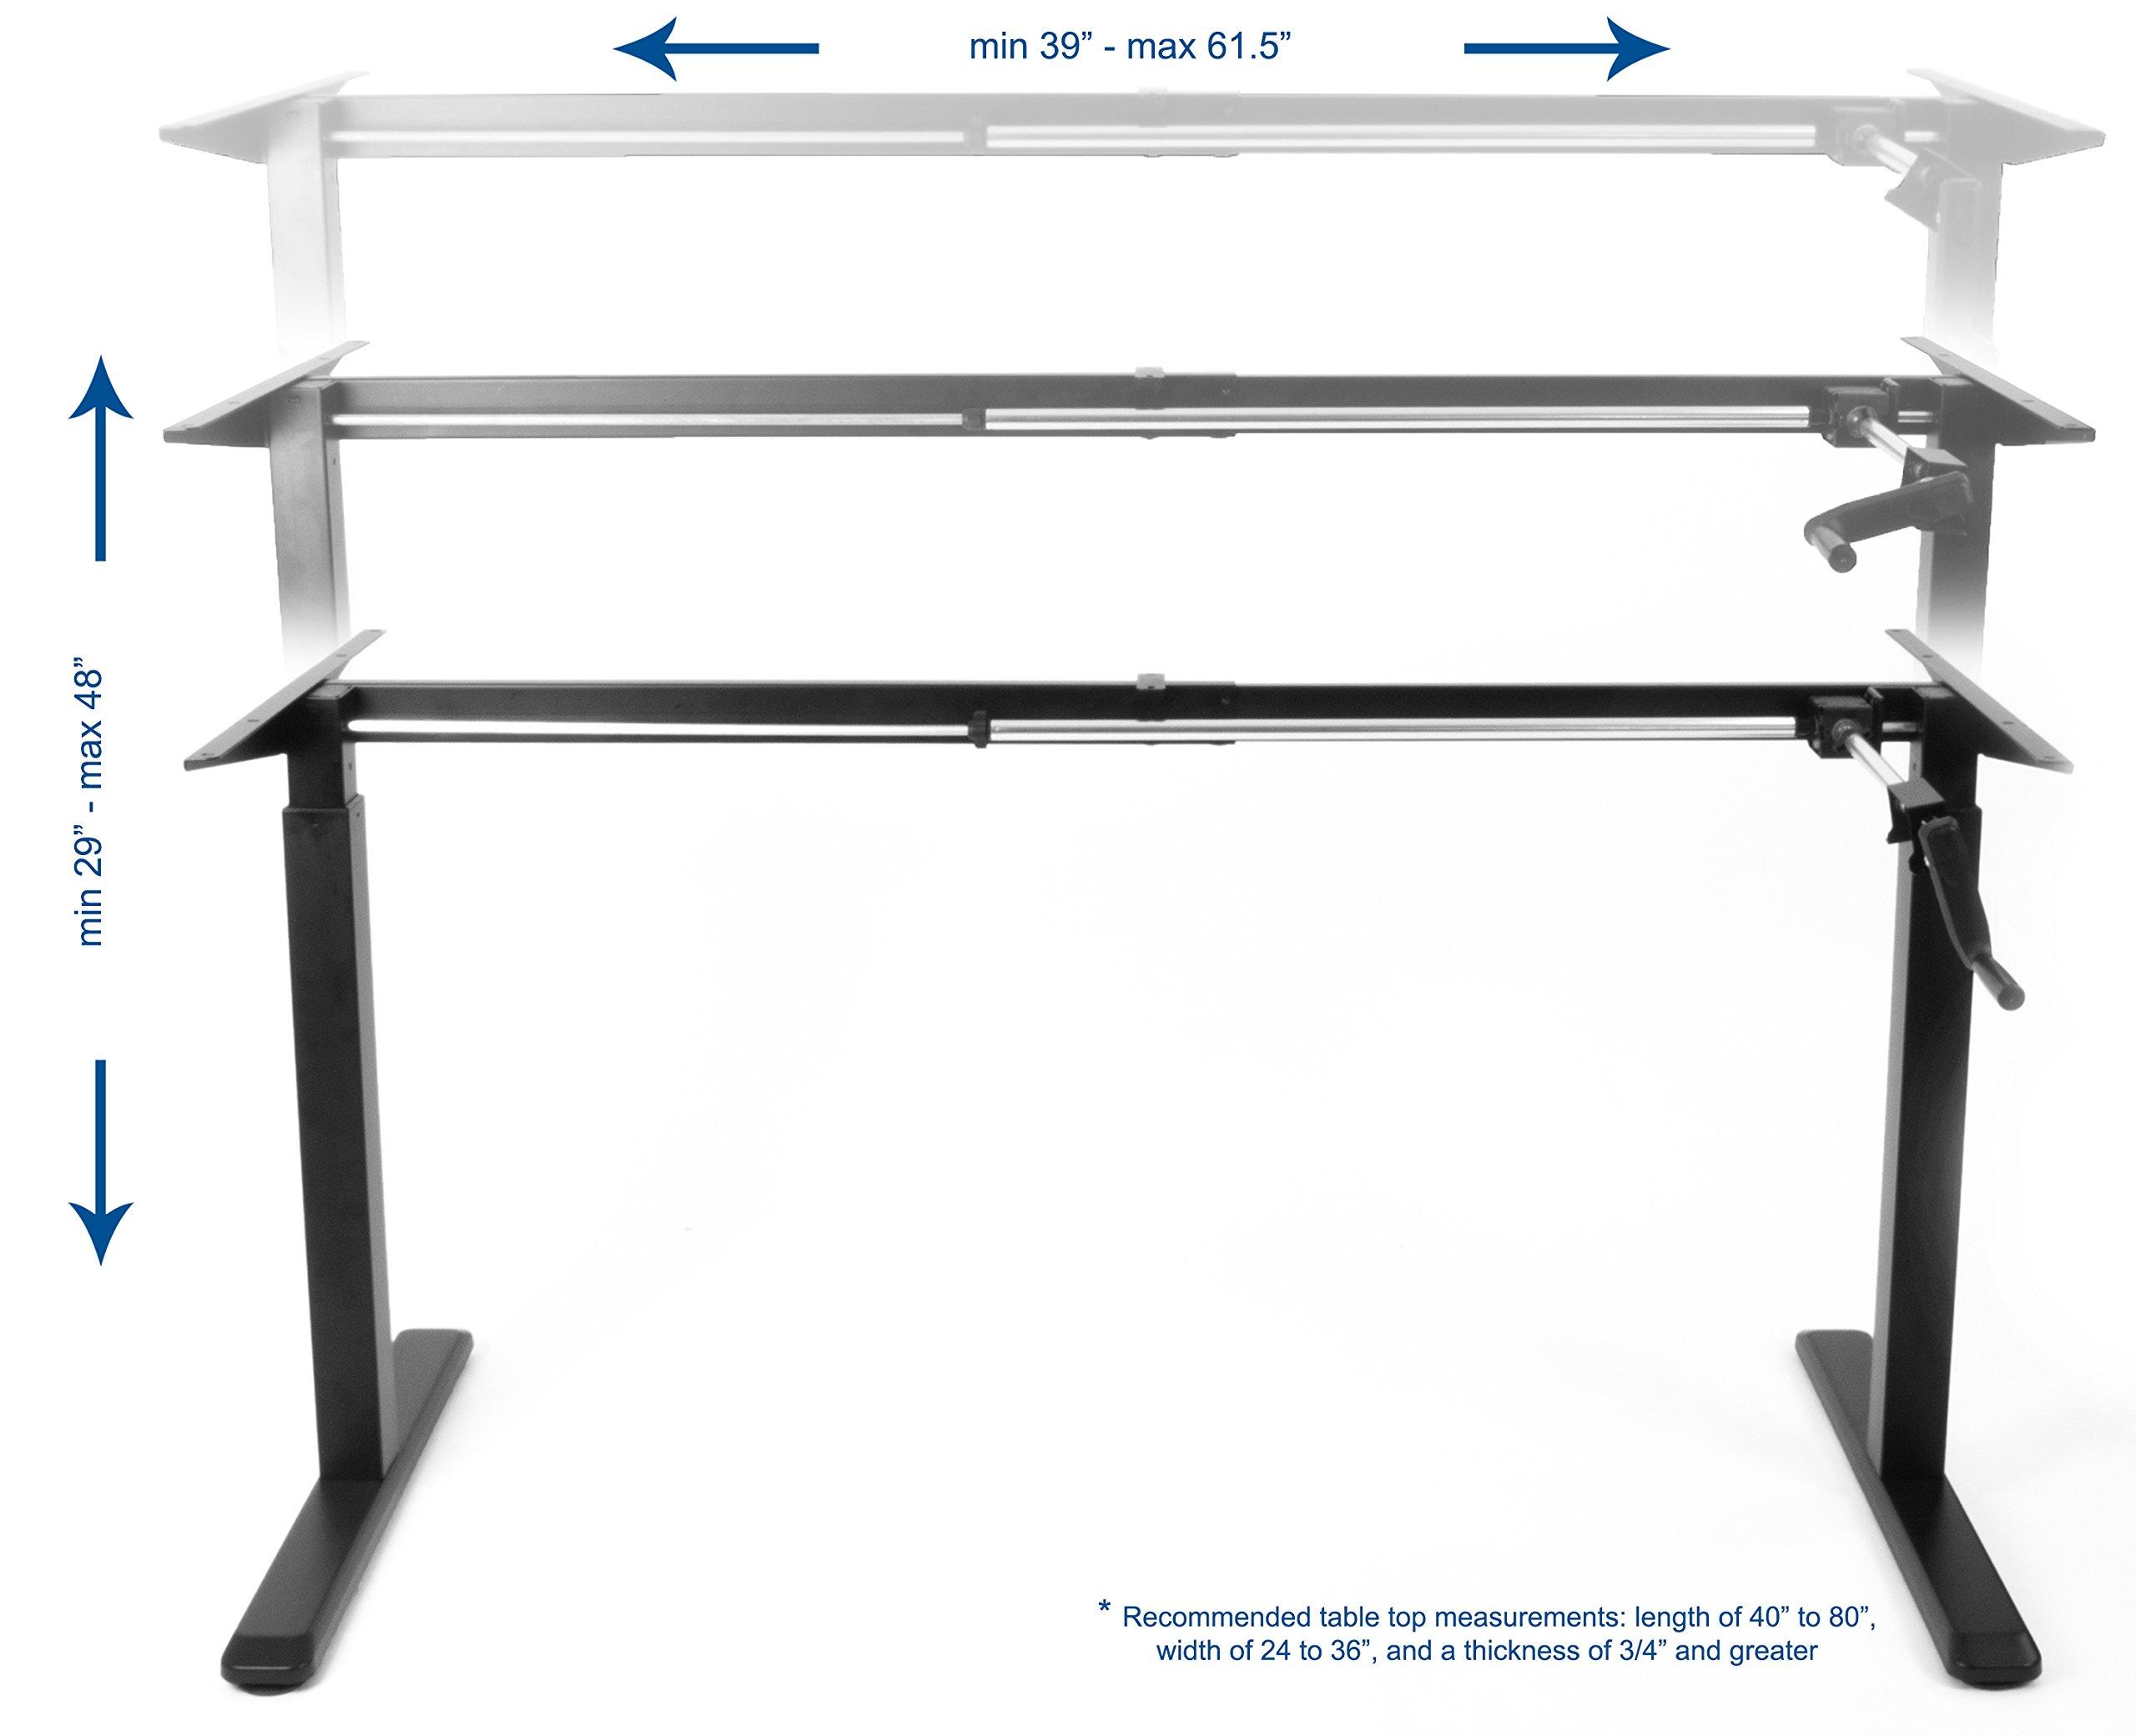 b level product walnut reg split dw c dark crank ag luxor tier h adjustable stand two up desk